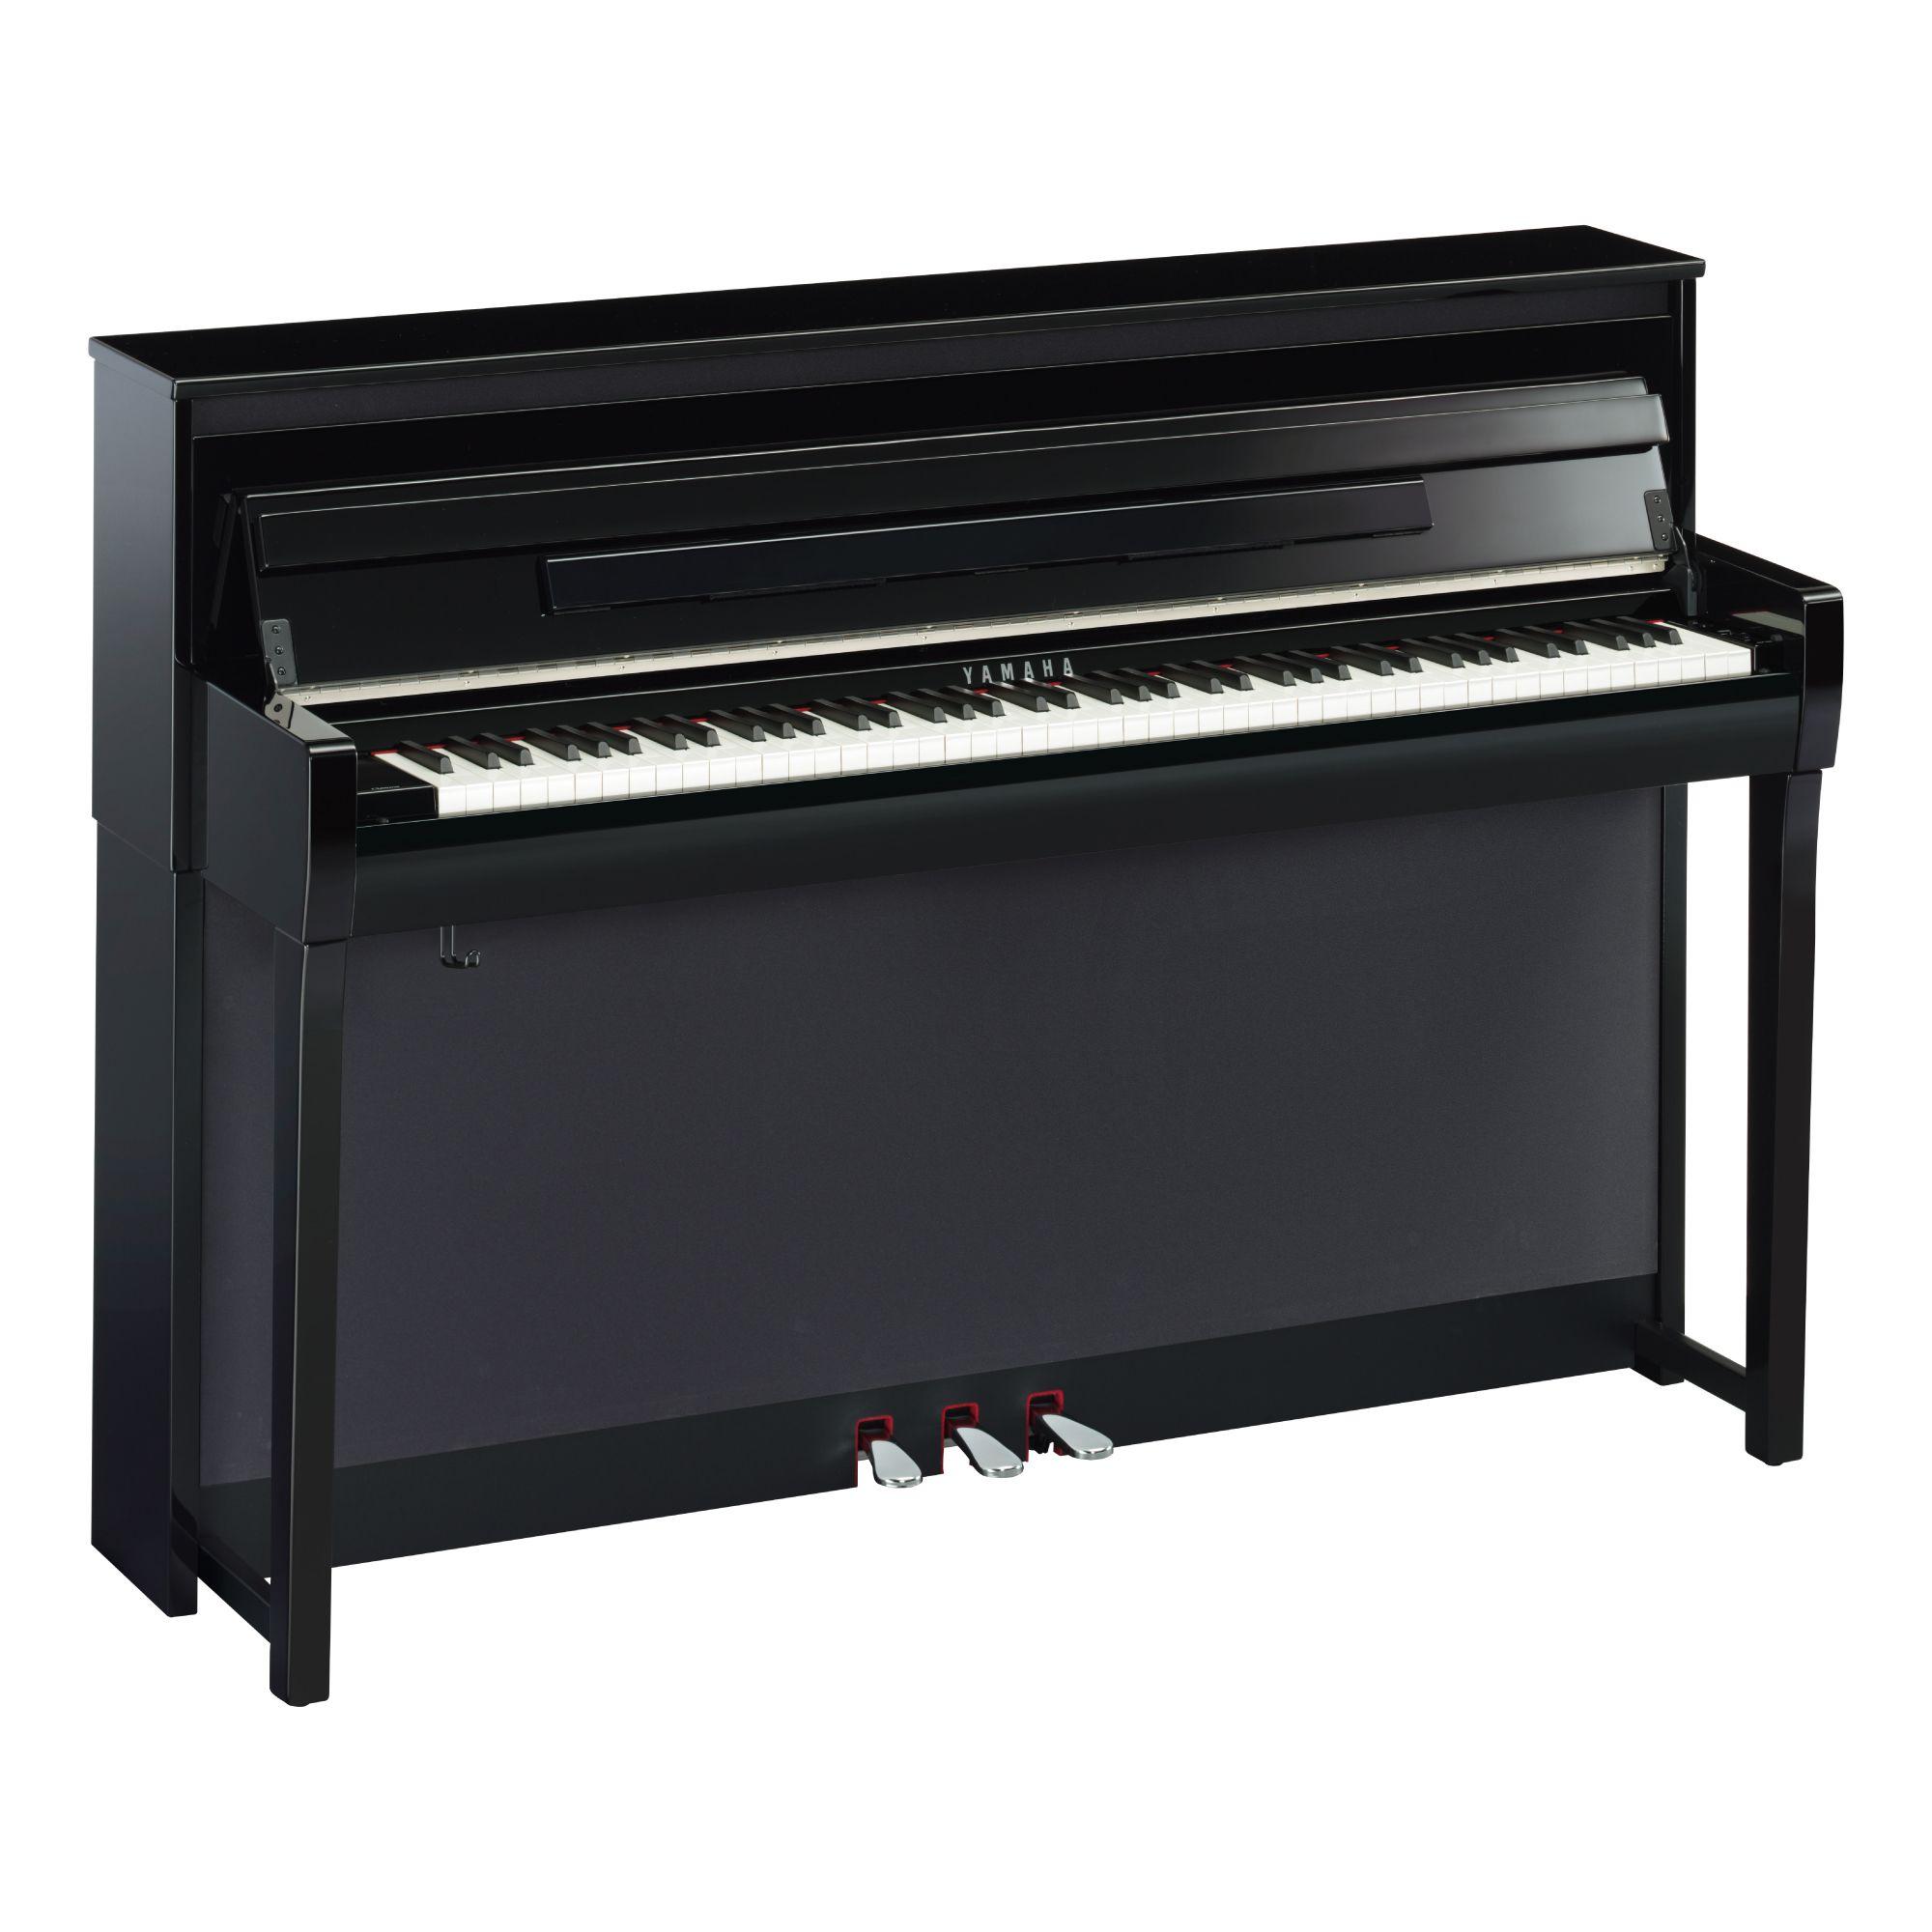 Yamaha clp-785 Clavinova CLP700 stage digitale keyboard home piano mezza coda muro strumenti musicali